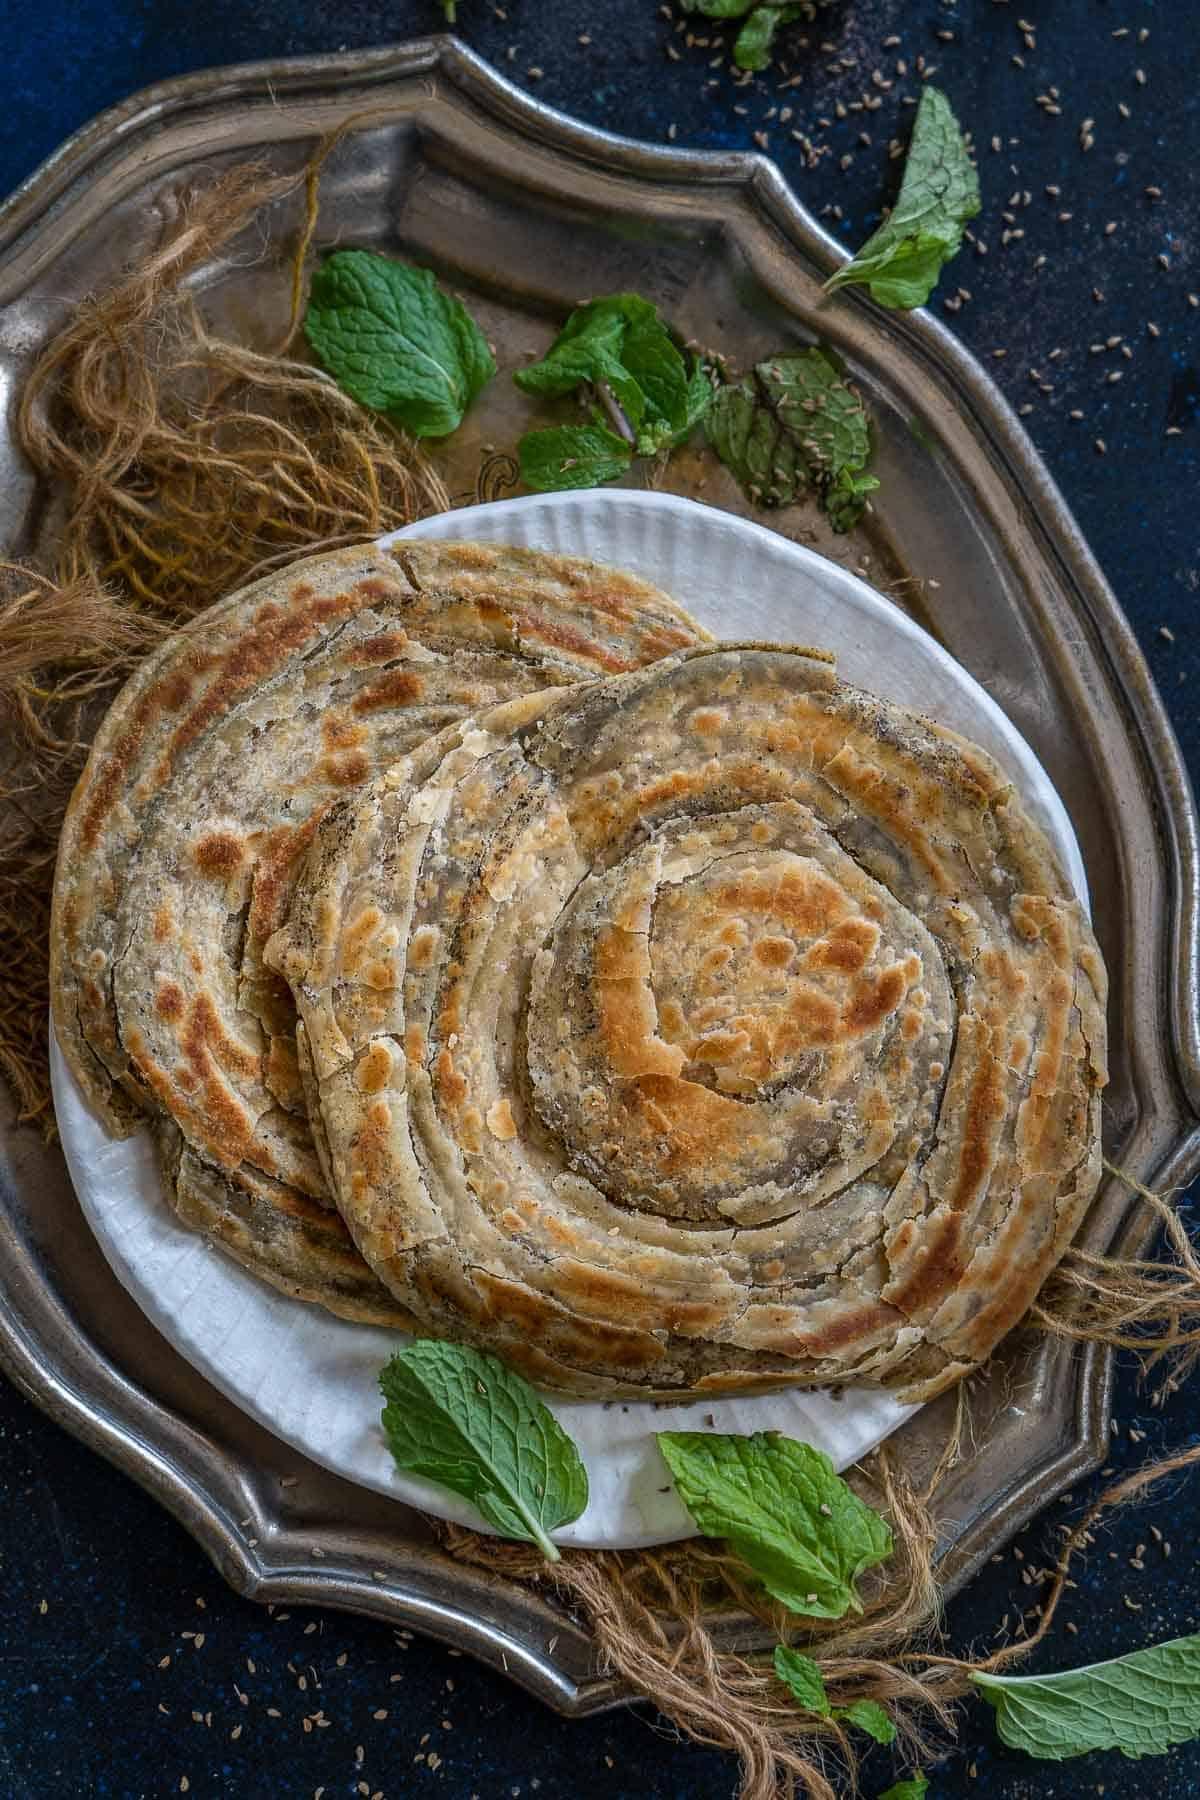 Mint Lachha paratha served on a plate.